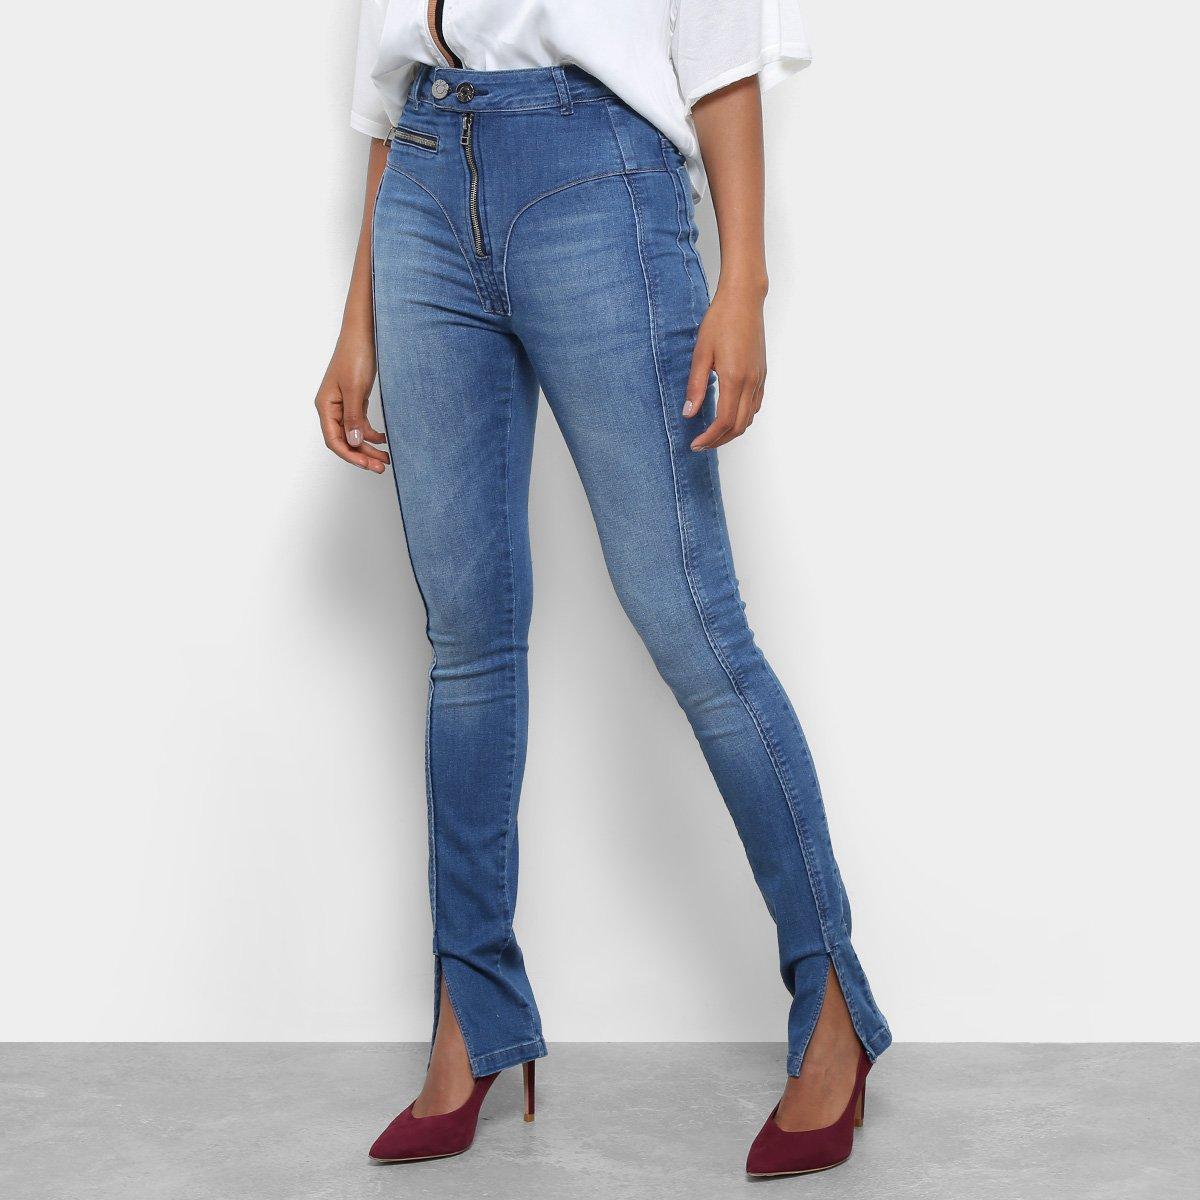 Calça Jeans Skinny Open Recorte Frontal Cintura Média Feminina5